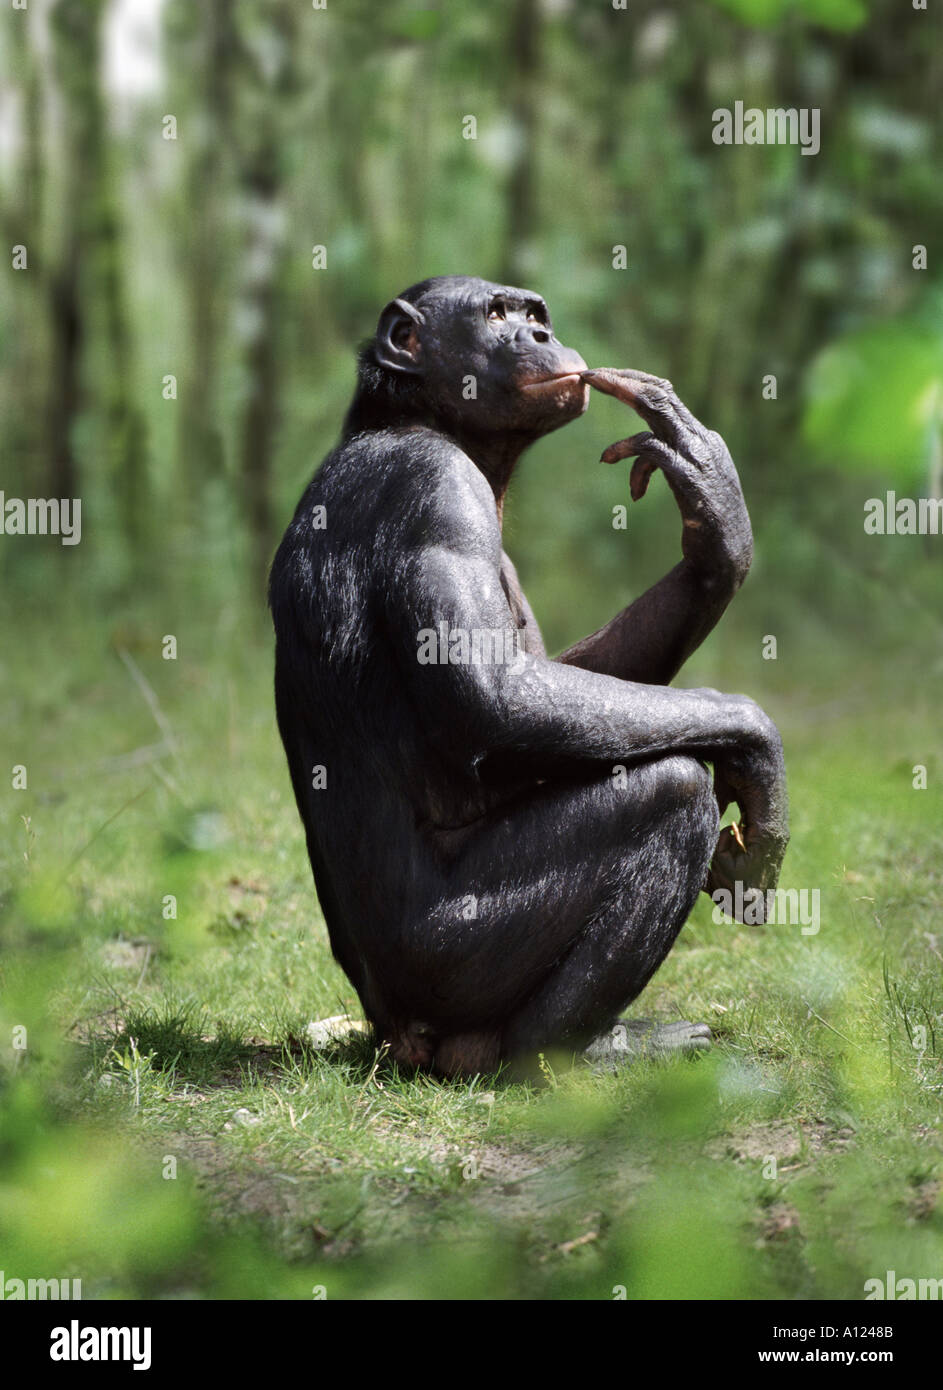 Bonobo - Stock Image